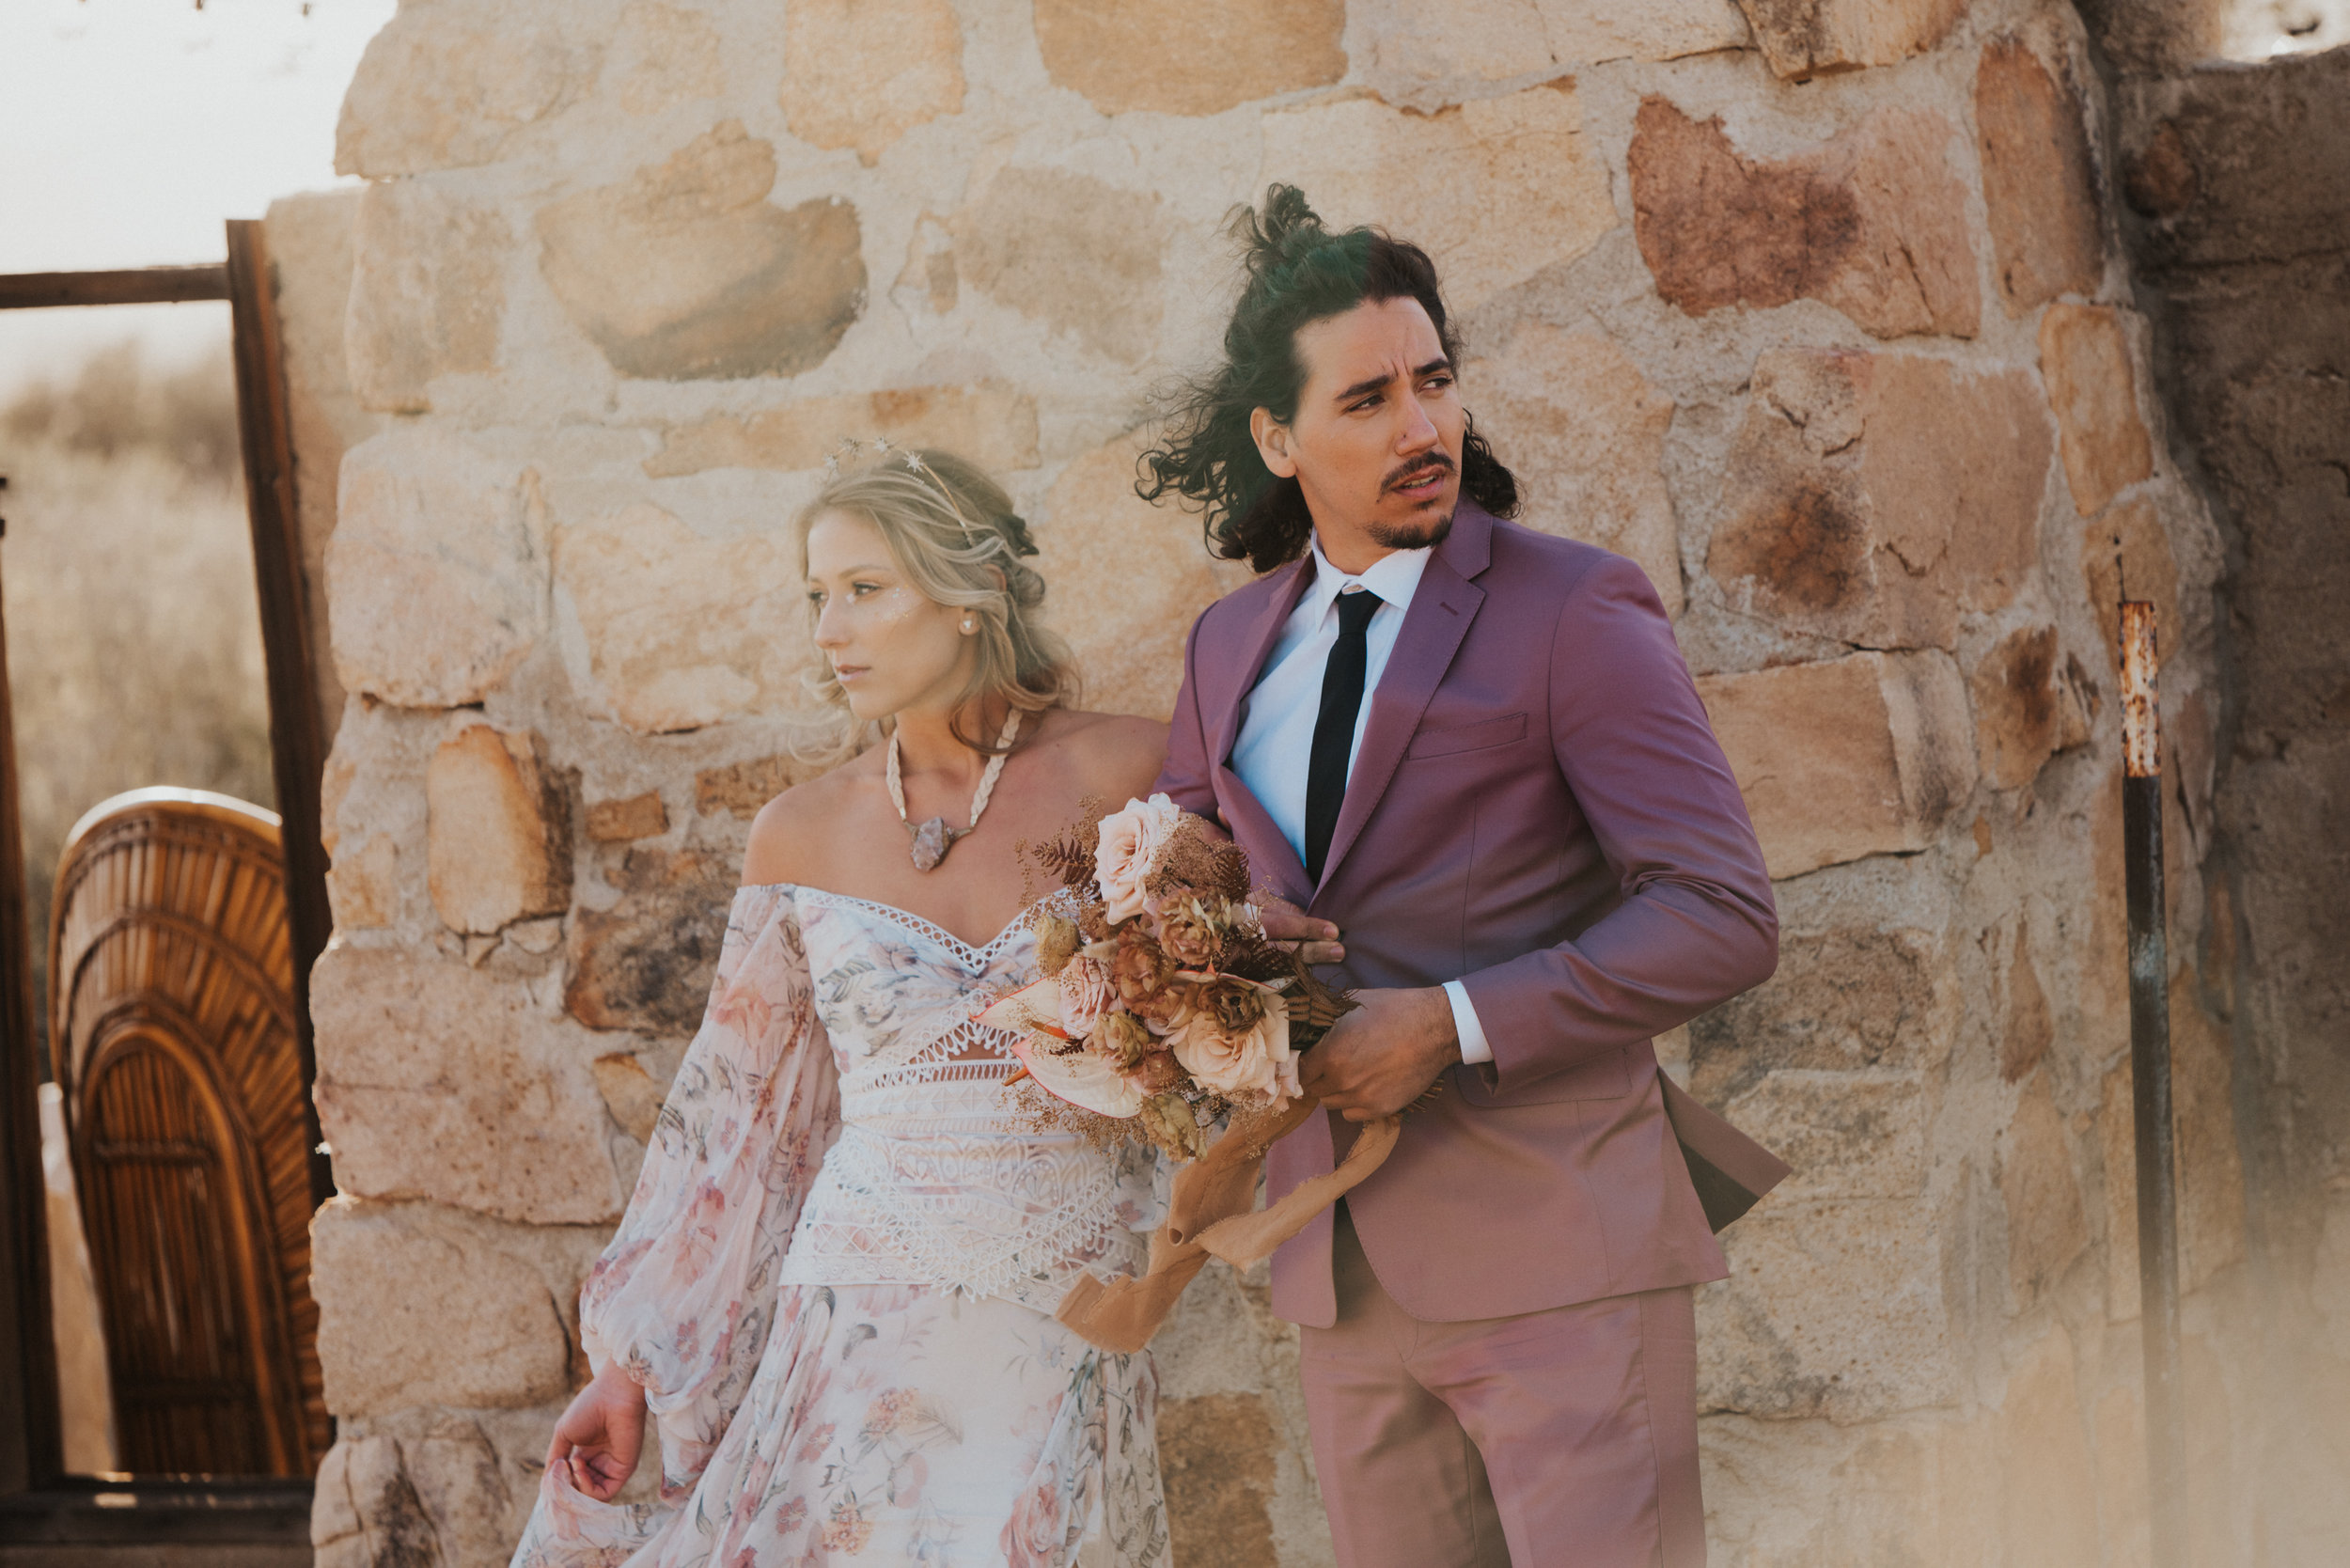 FortSt.John_photographer_TyraEPhotography_Wedding_Couple_Family_Photograhy_DawsonCreek_Elopement_Bride_Boduoir_Portraits-5073.jpg